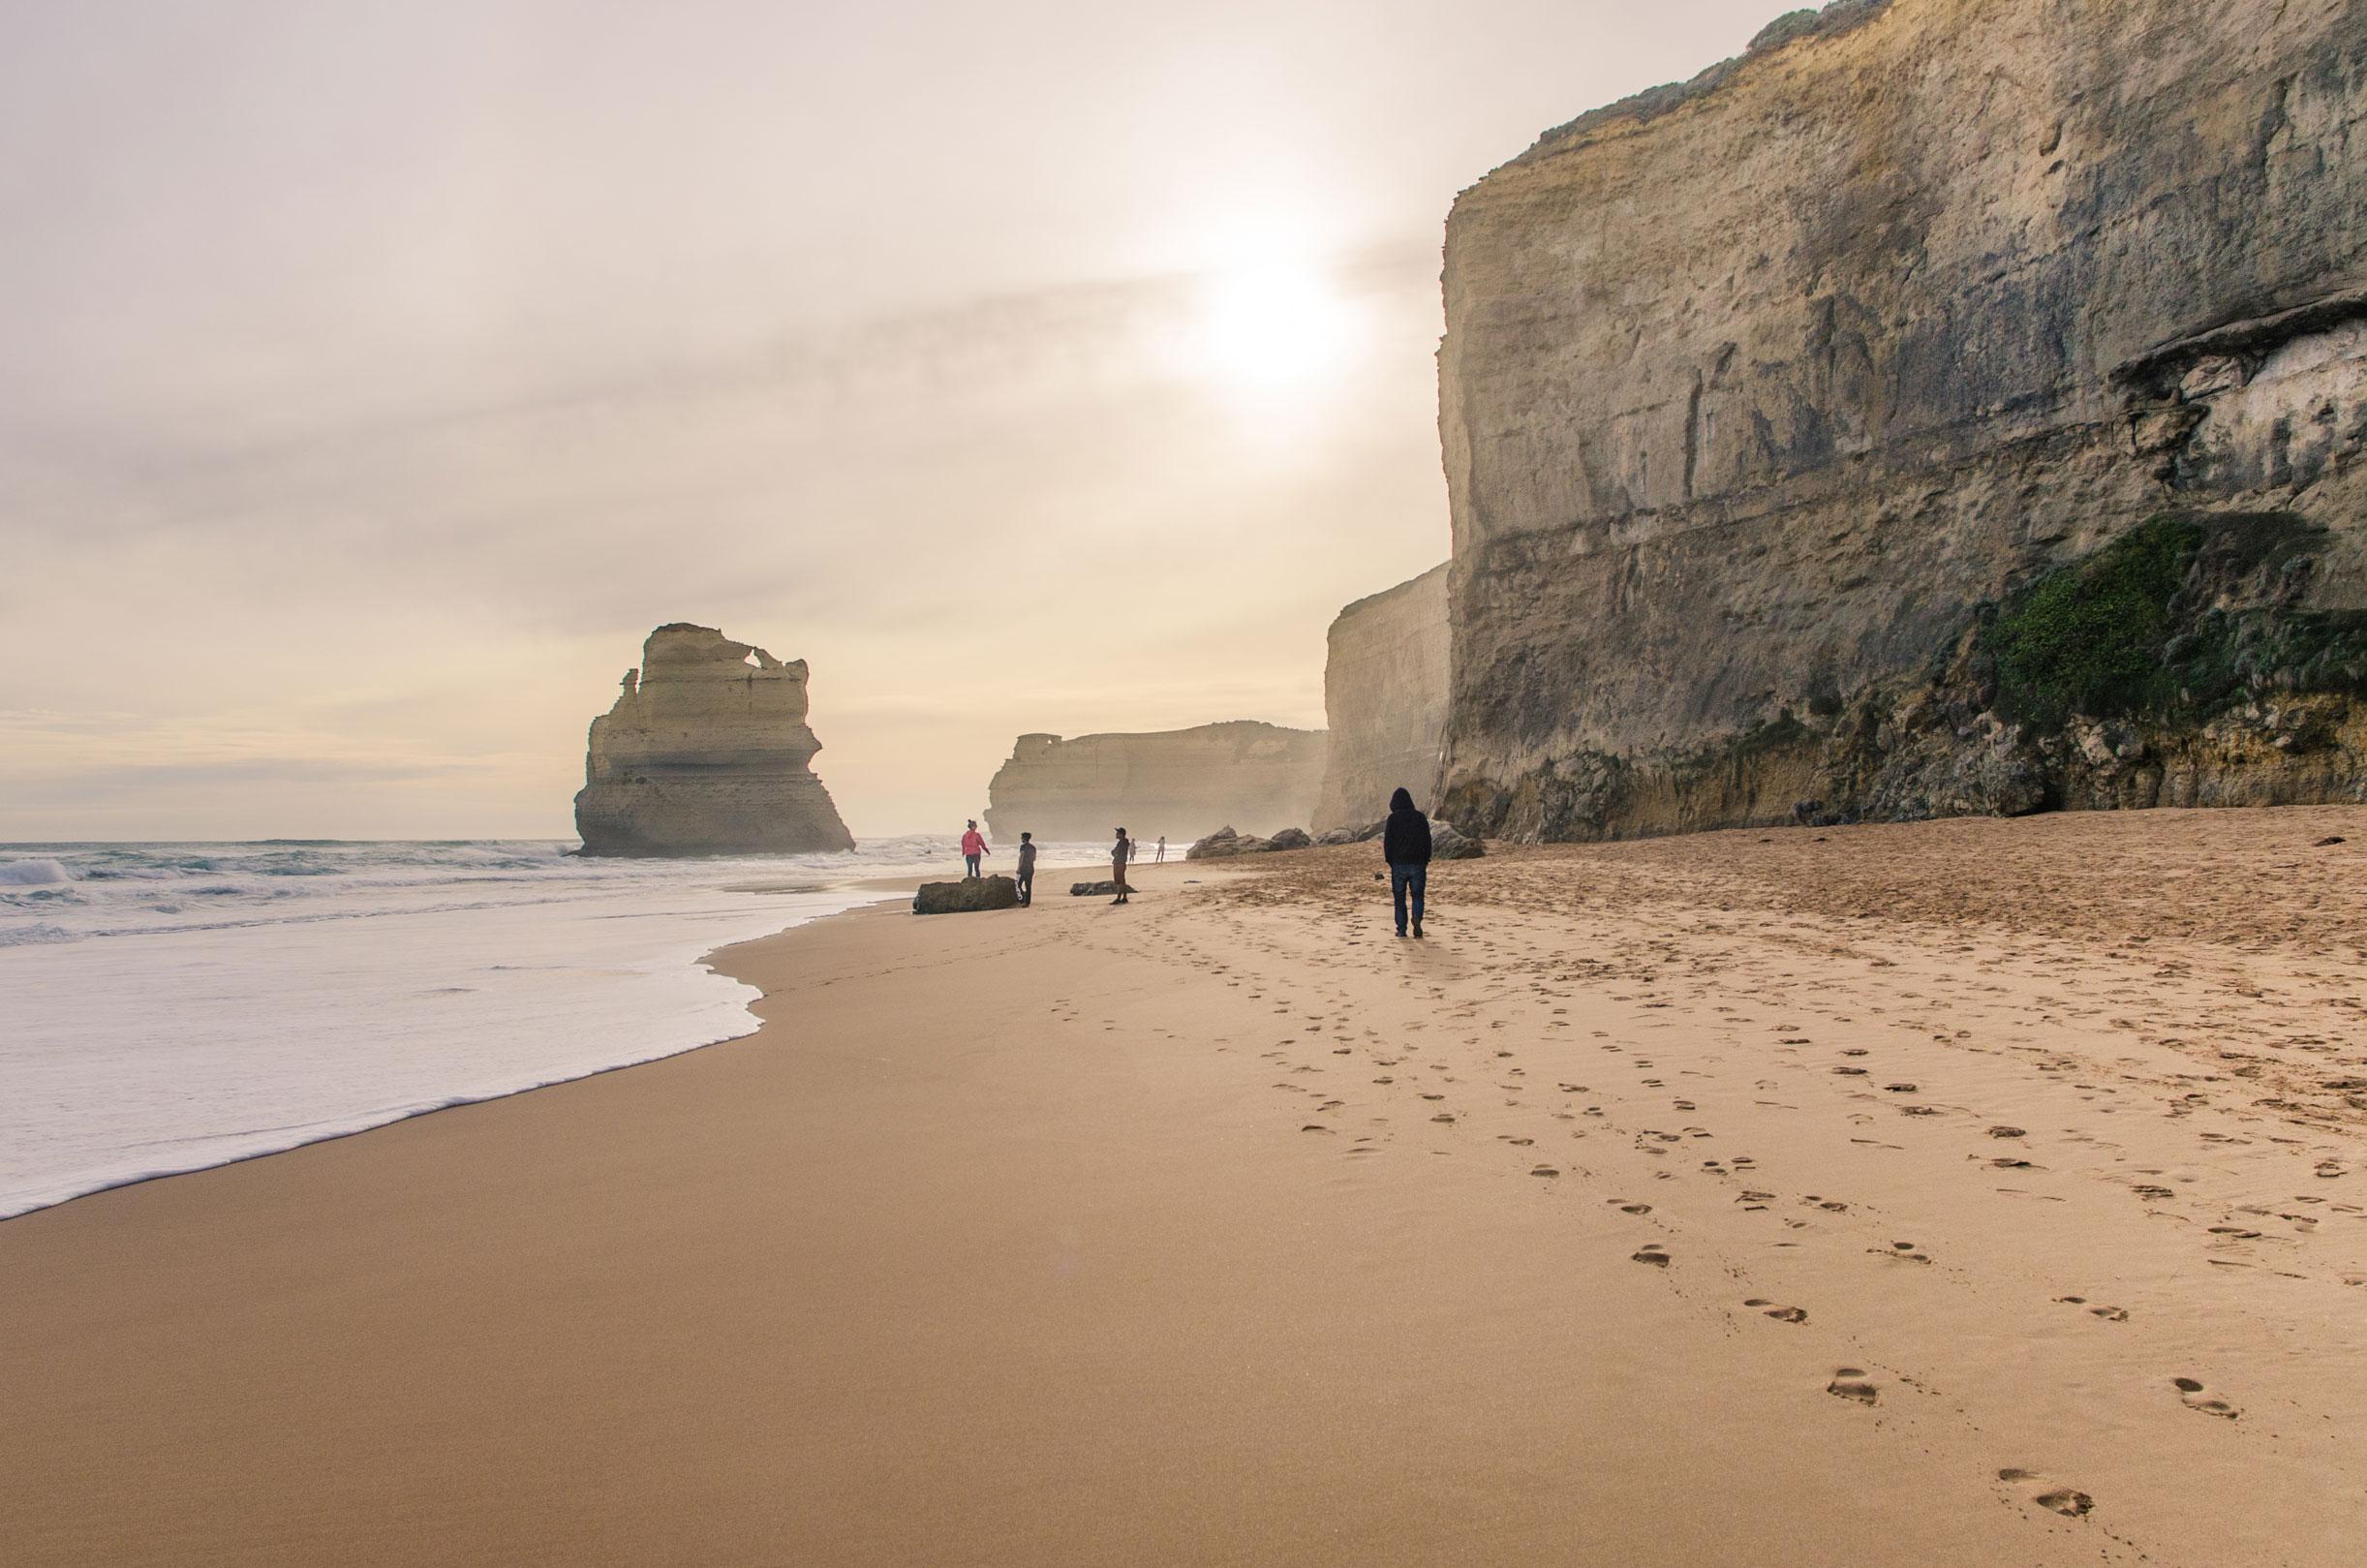 Paesaggi-Australia - DSC 6188 - 12-Apostoli-12-Apostoles-Australia - 12-Apostoli-12-Apostoles-Australia